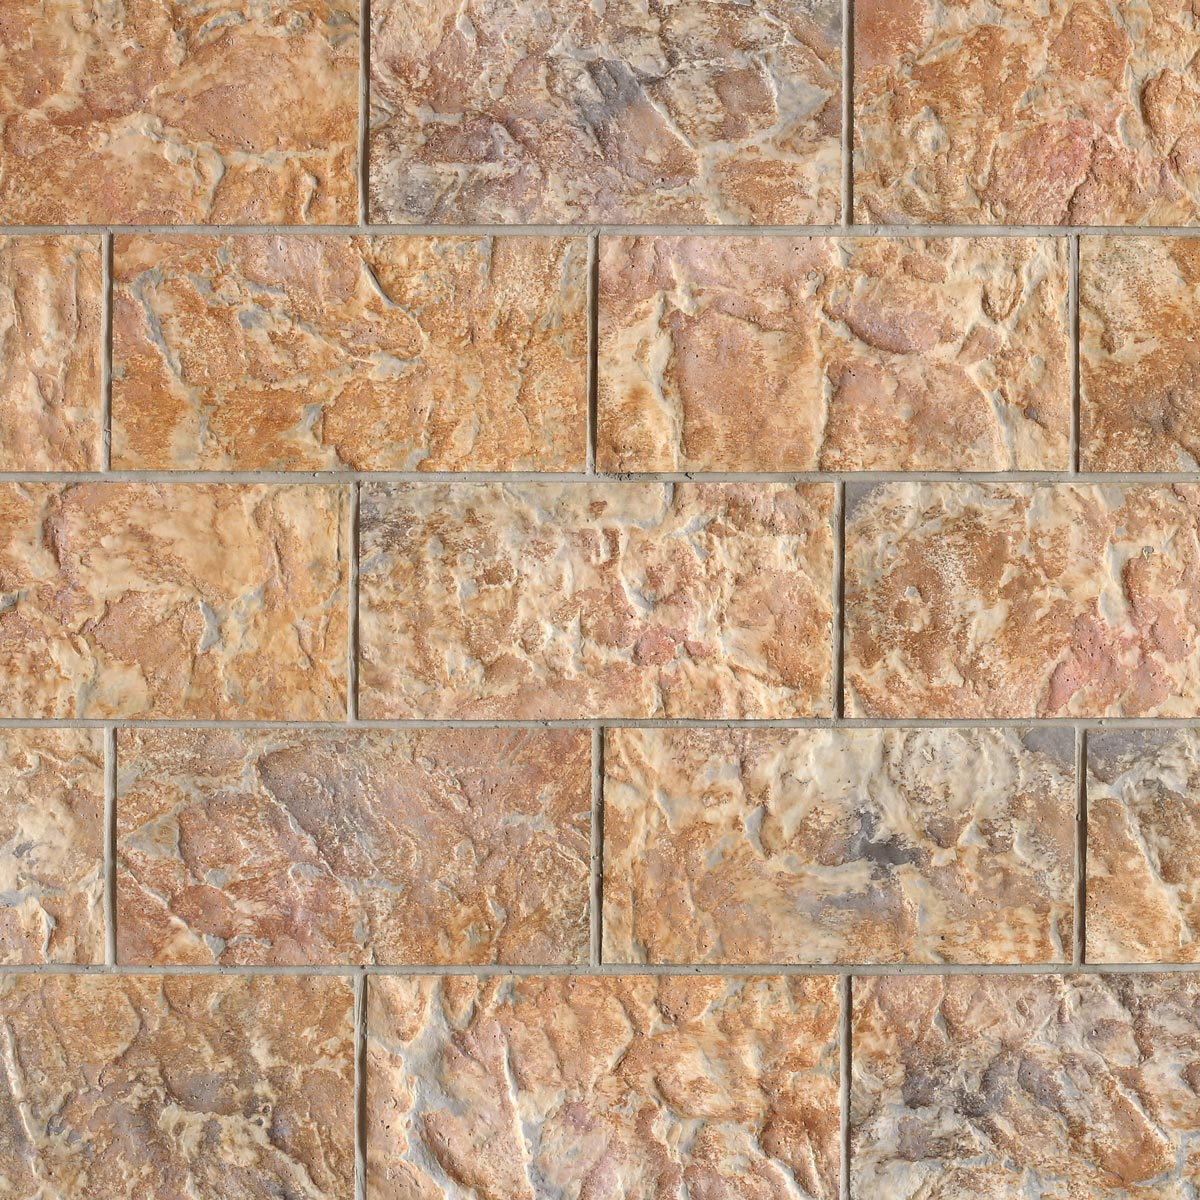 Tepostone Εύκαμπτη Πέτρα No1-No16 [No 12]